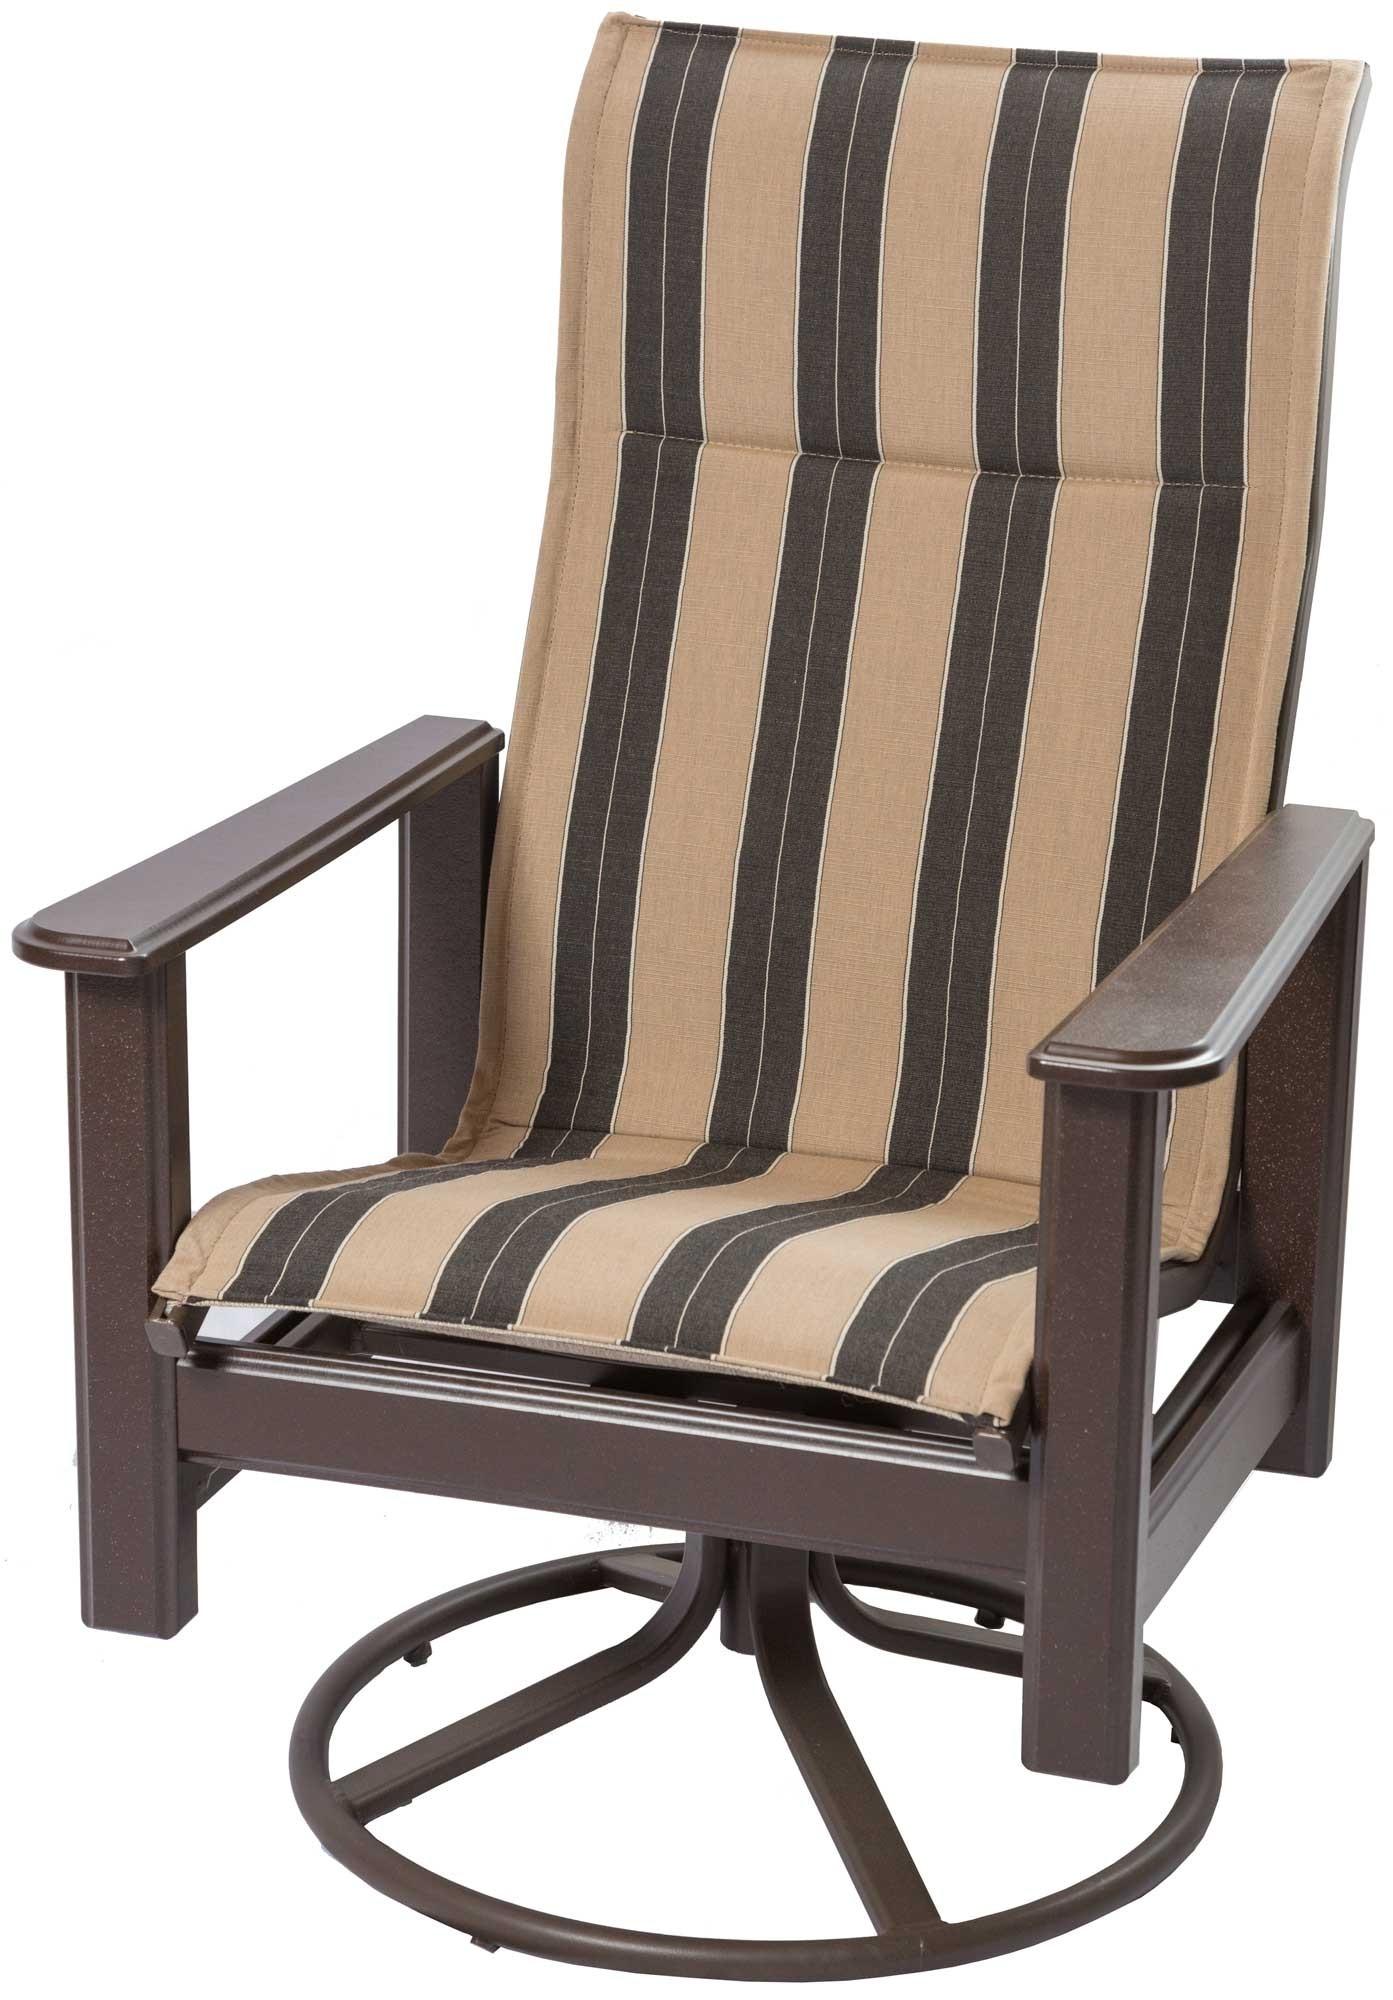 High Back Outdoor Swivel Rocker | Outdoor Swivel Rocking Chair Regarding High Back Rocking Chairs (View 15 of 15)